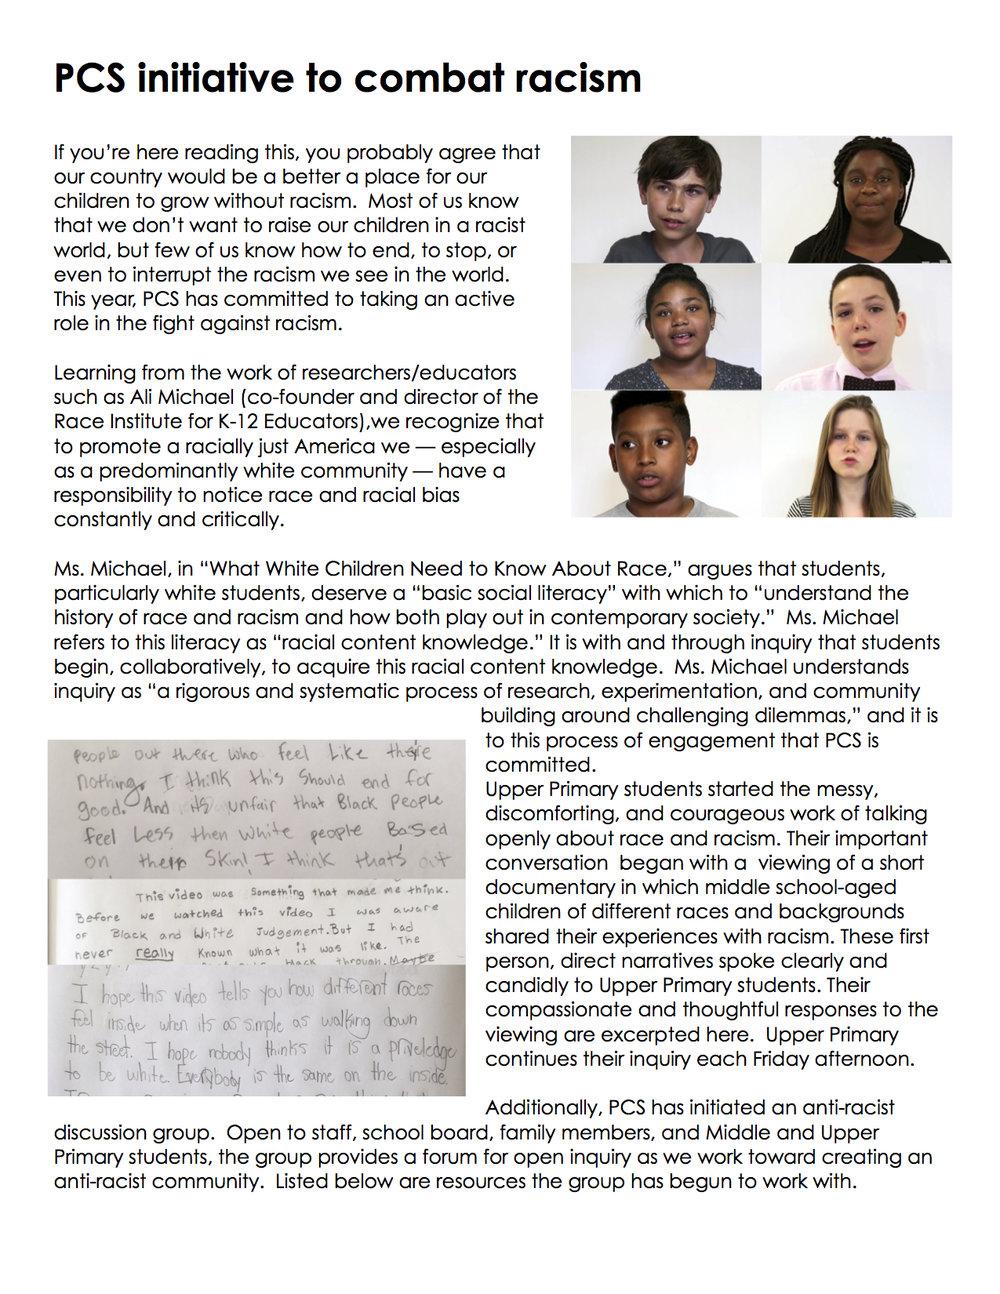 racism document JPG.jpg